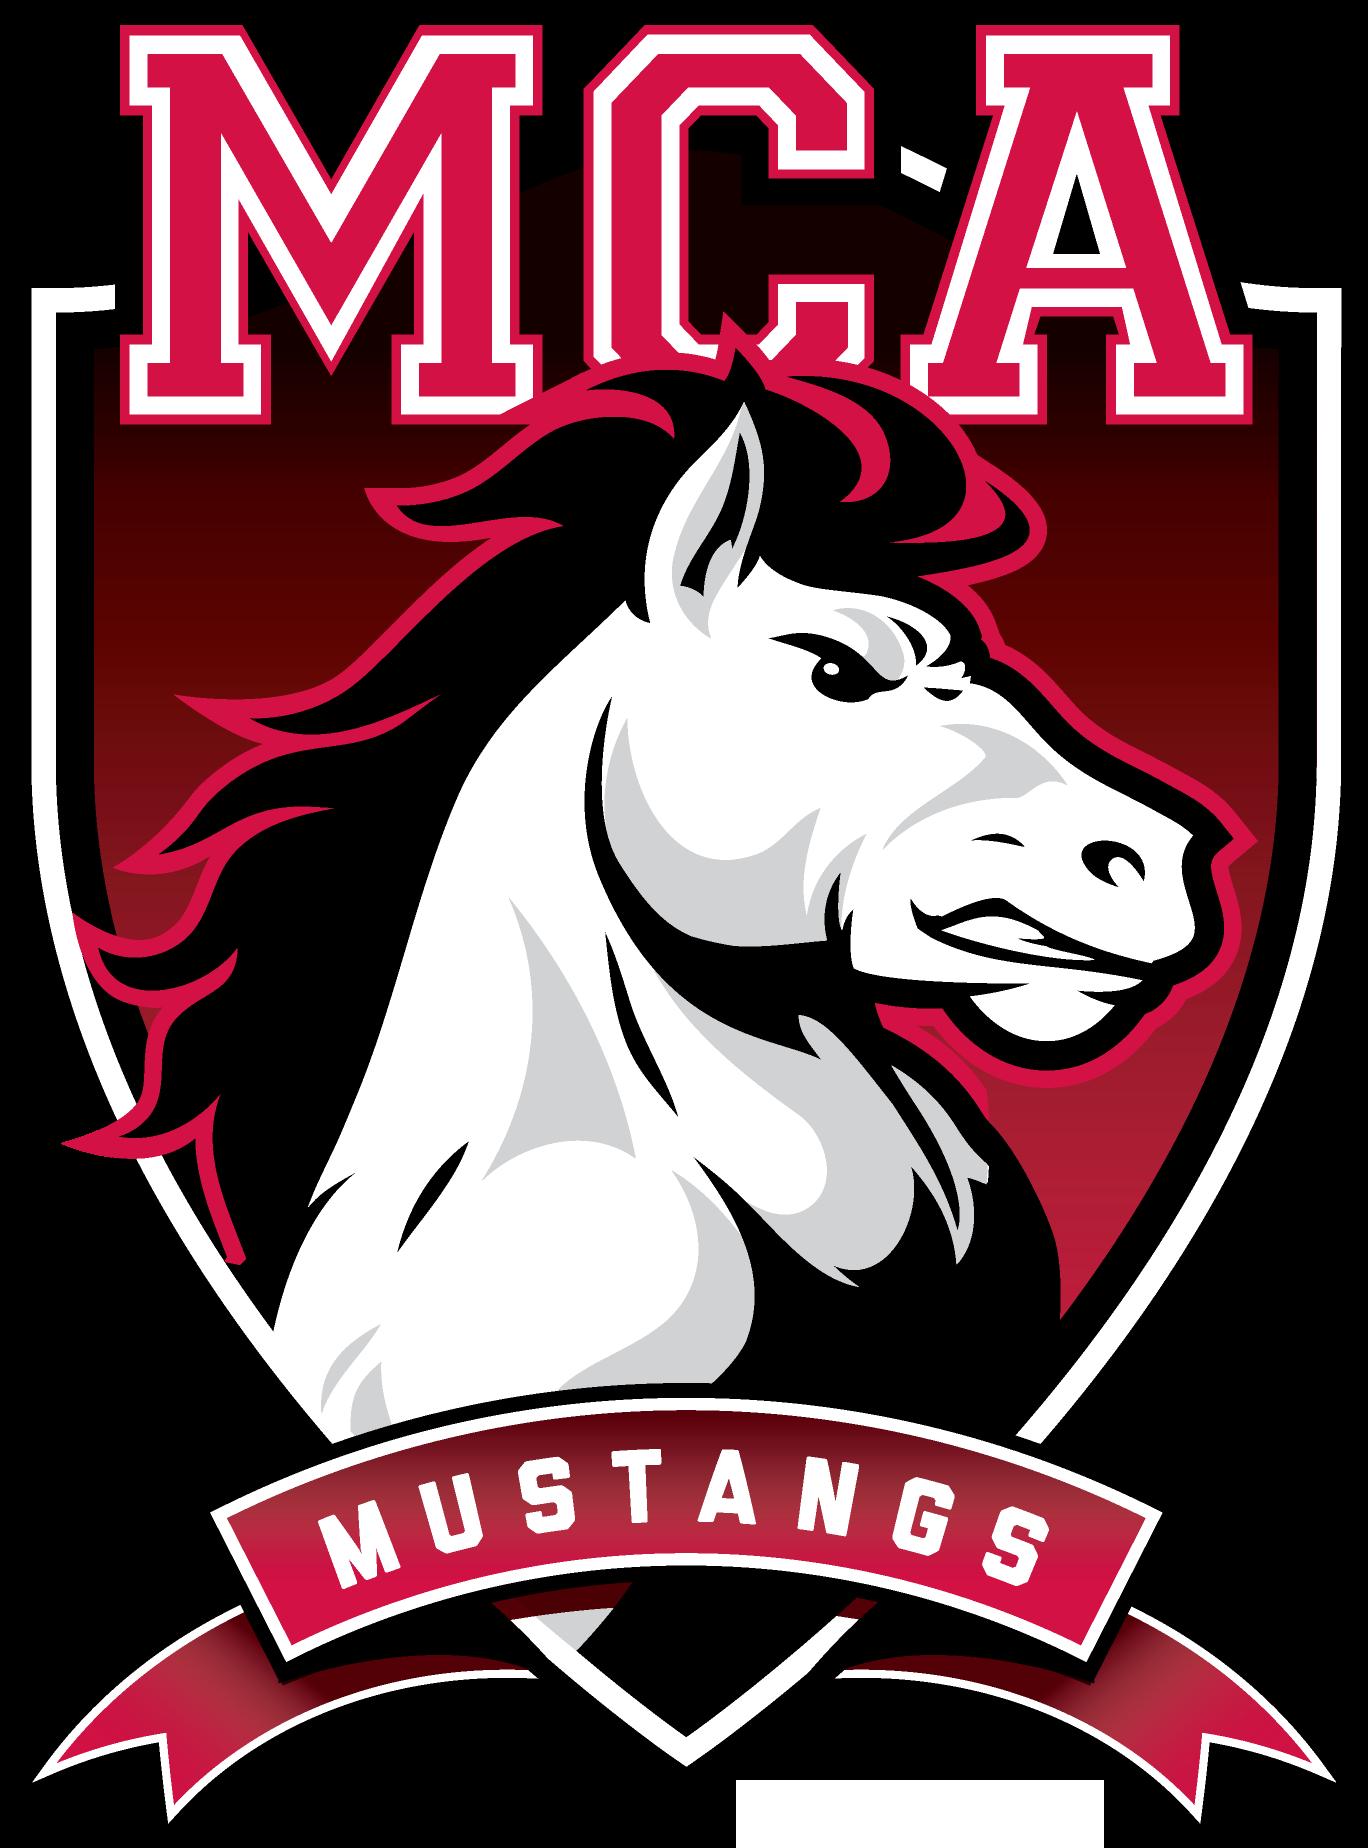 Mustang clipart mustang logo. Maranatha christian academy team